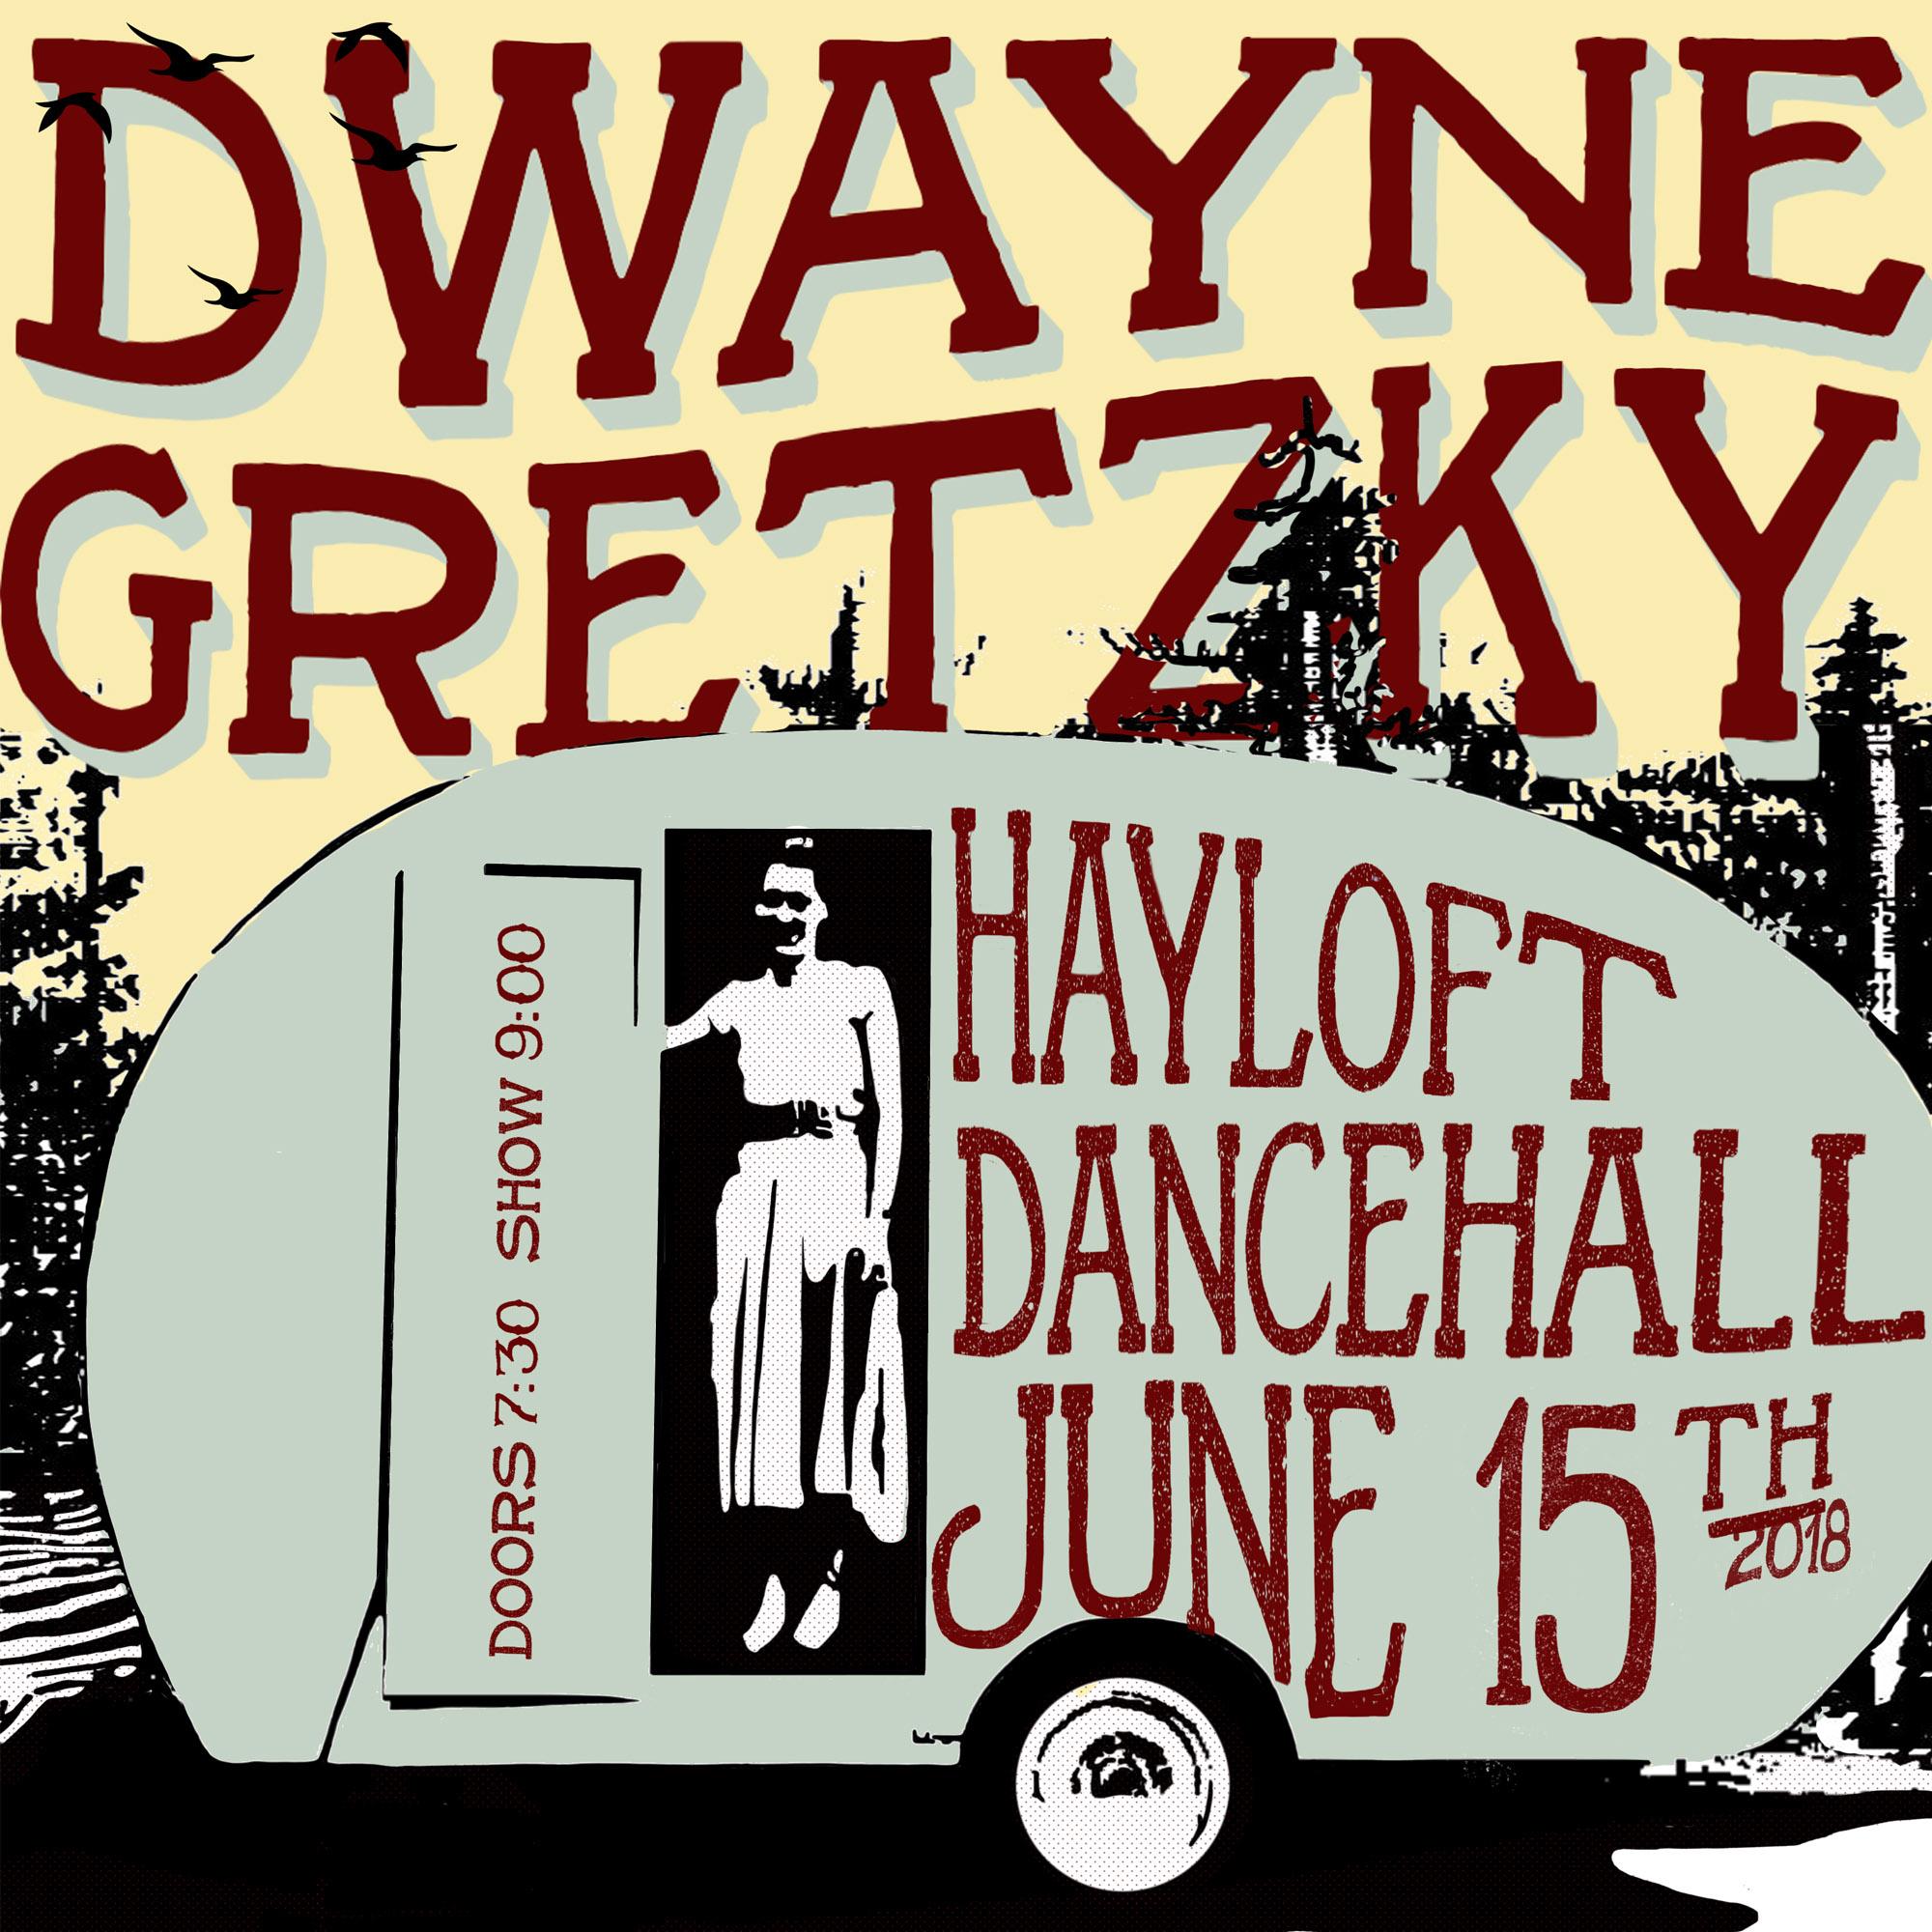 Dwayne Gretzky Hayloft